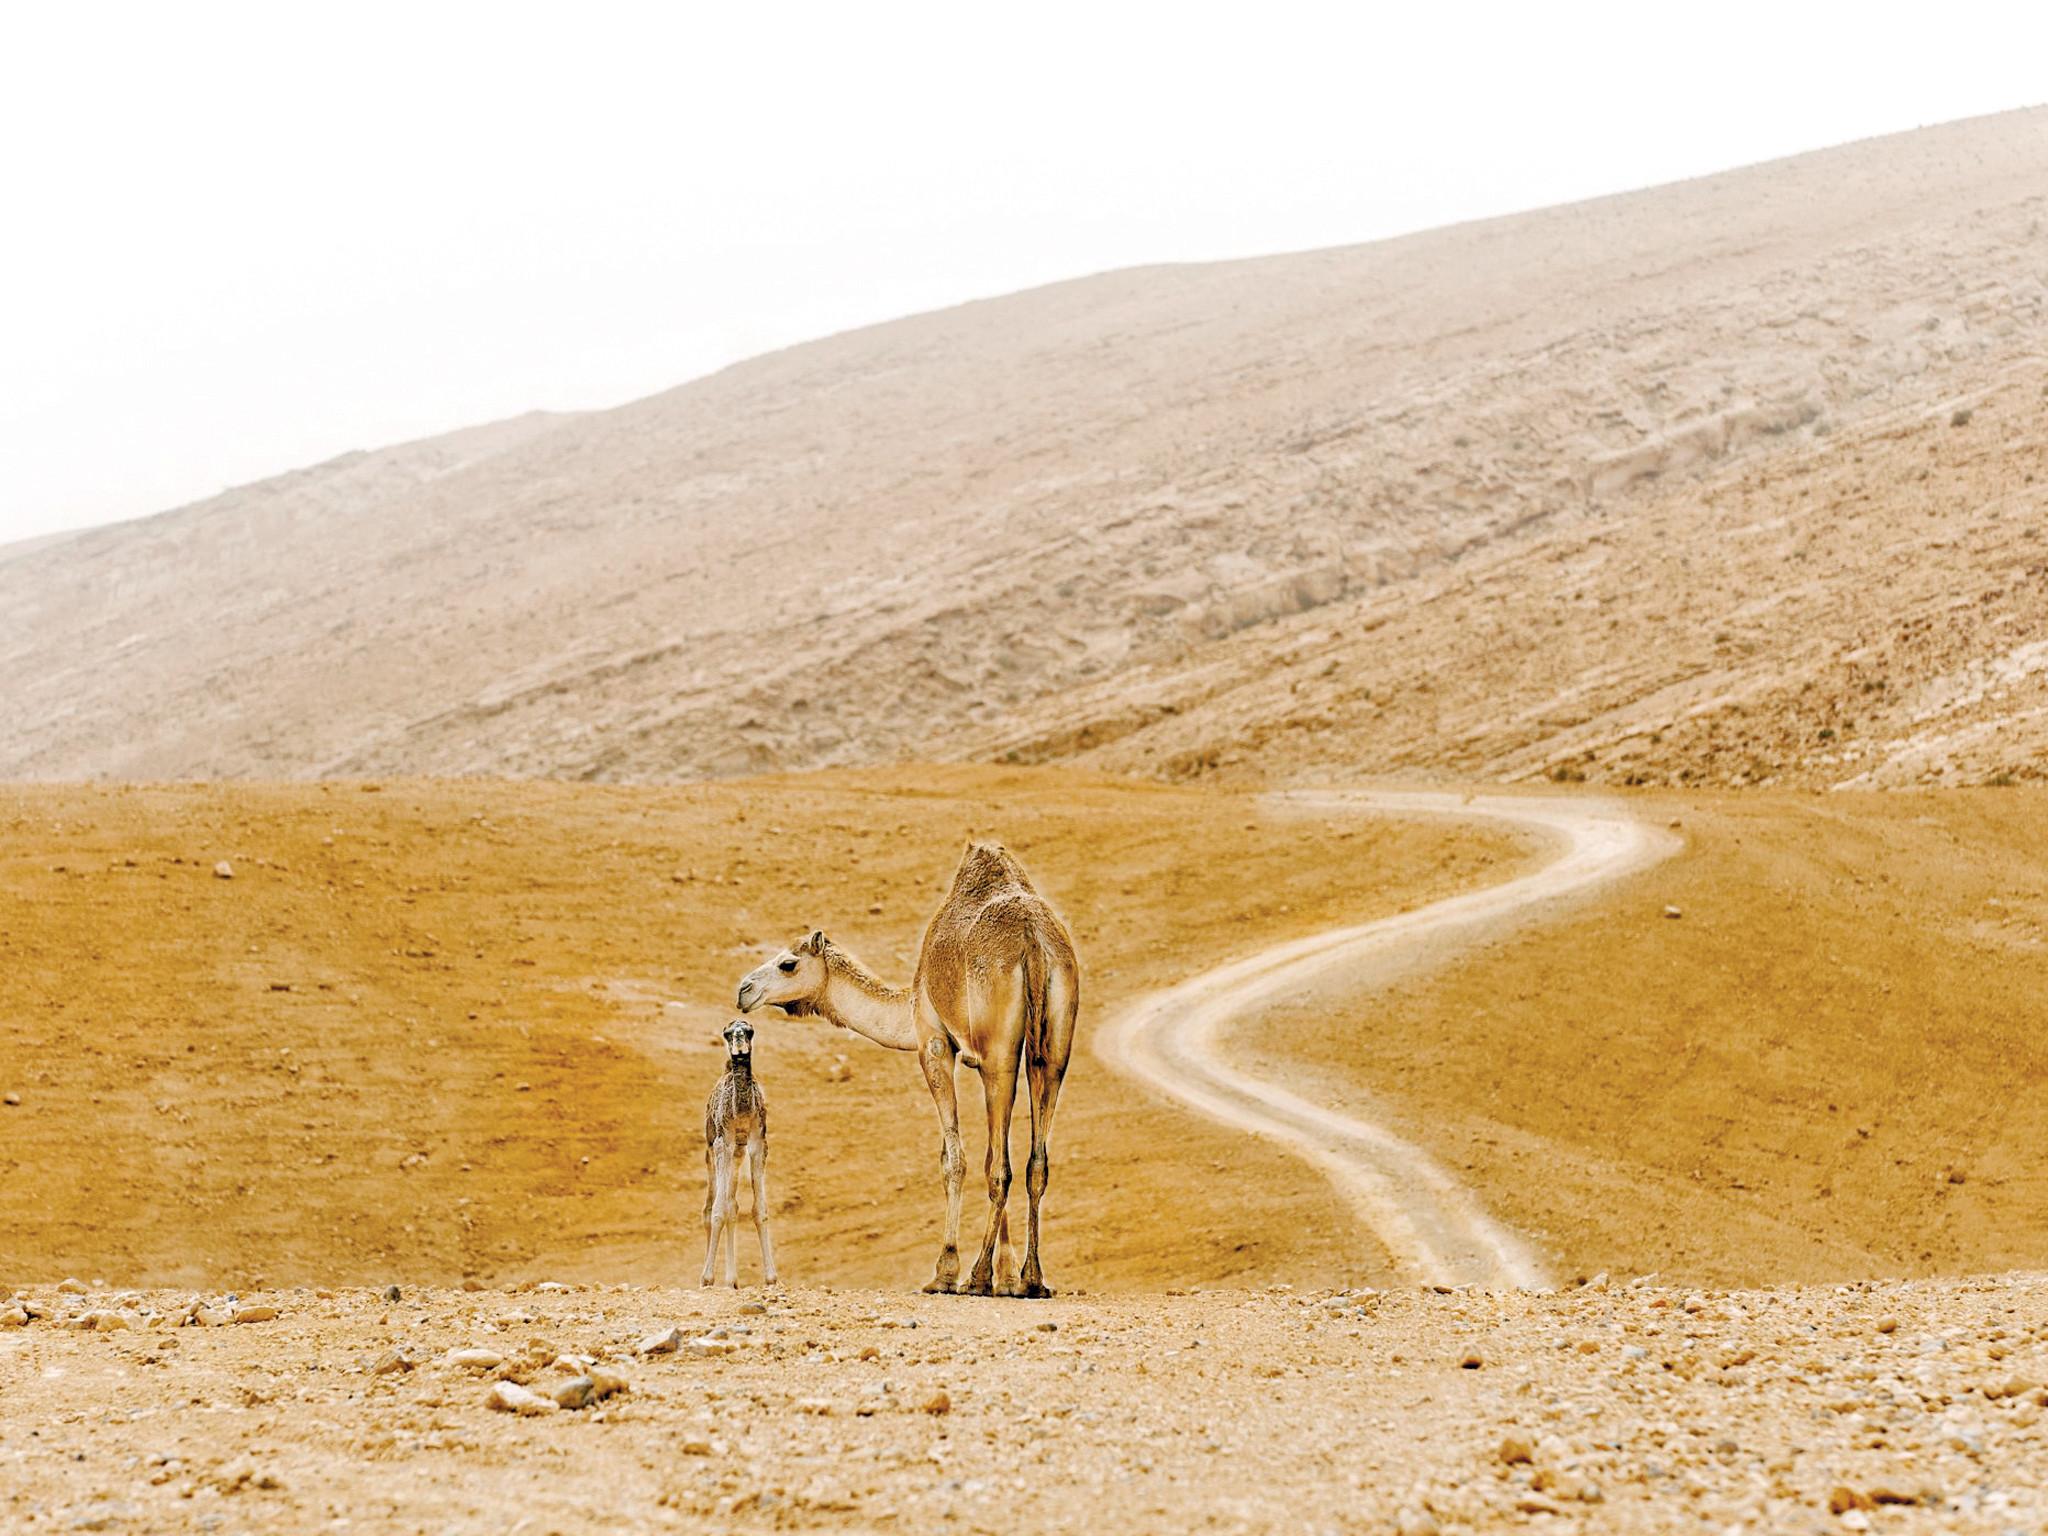 Israel Landscape 49625 | MOVDATA